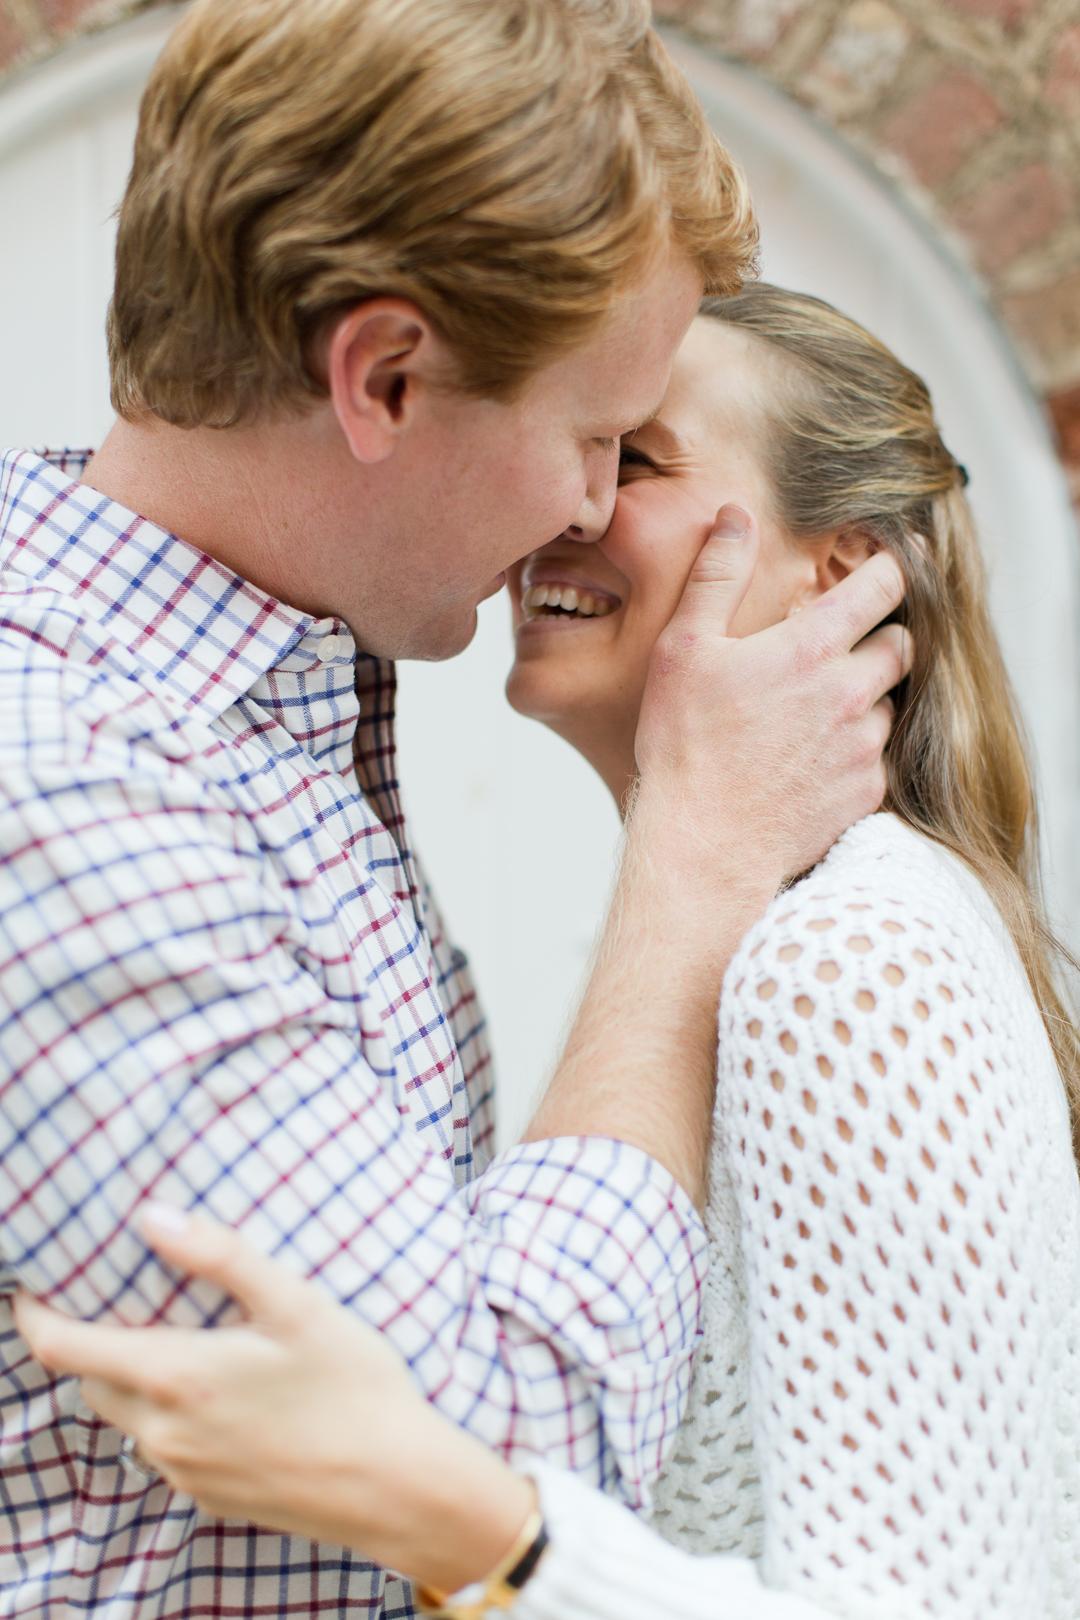 Melissa Kruse Photography - Megan & Tyler West Village Engagement Photos-31.jpg